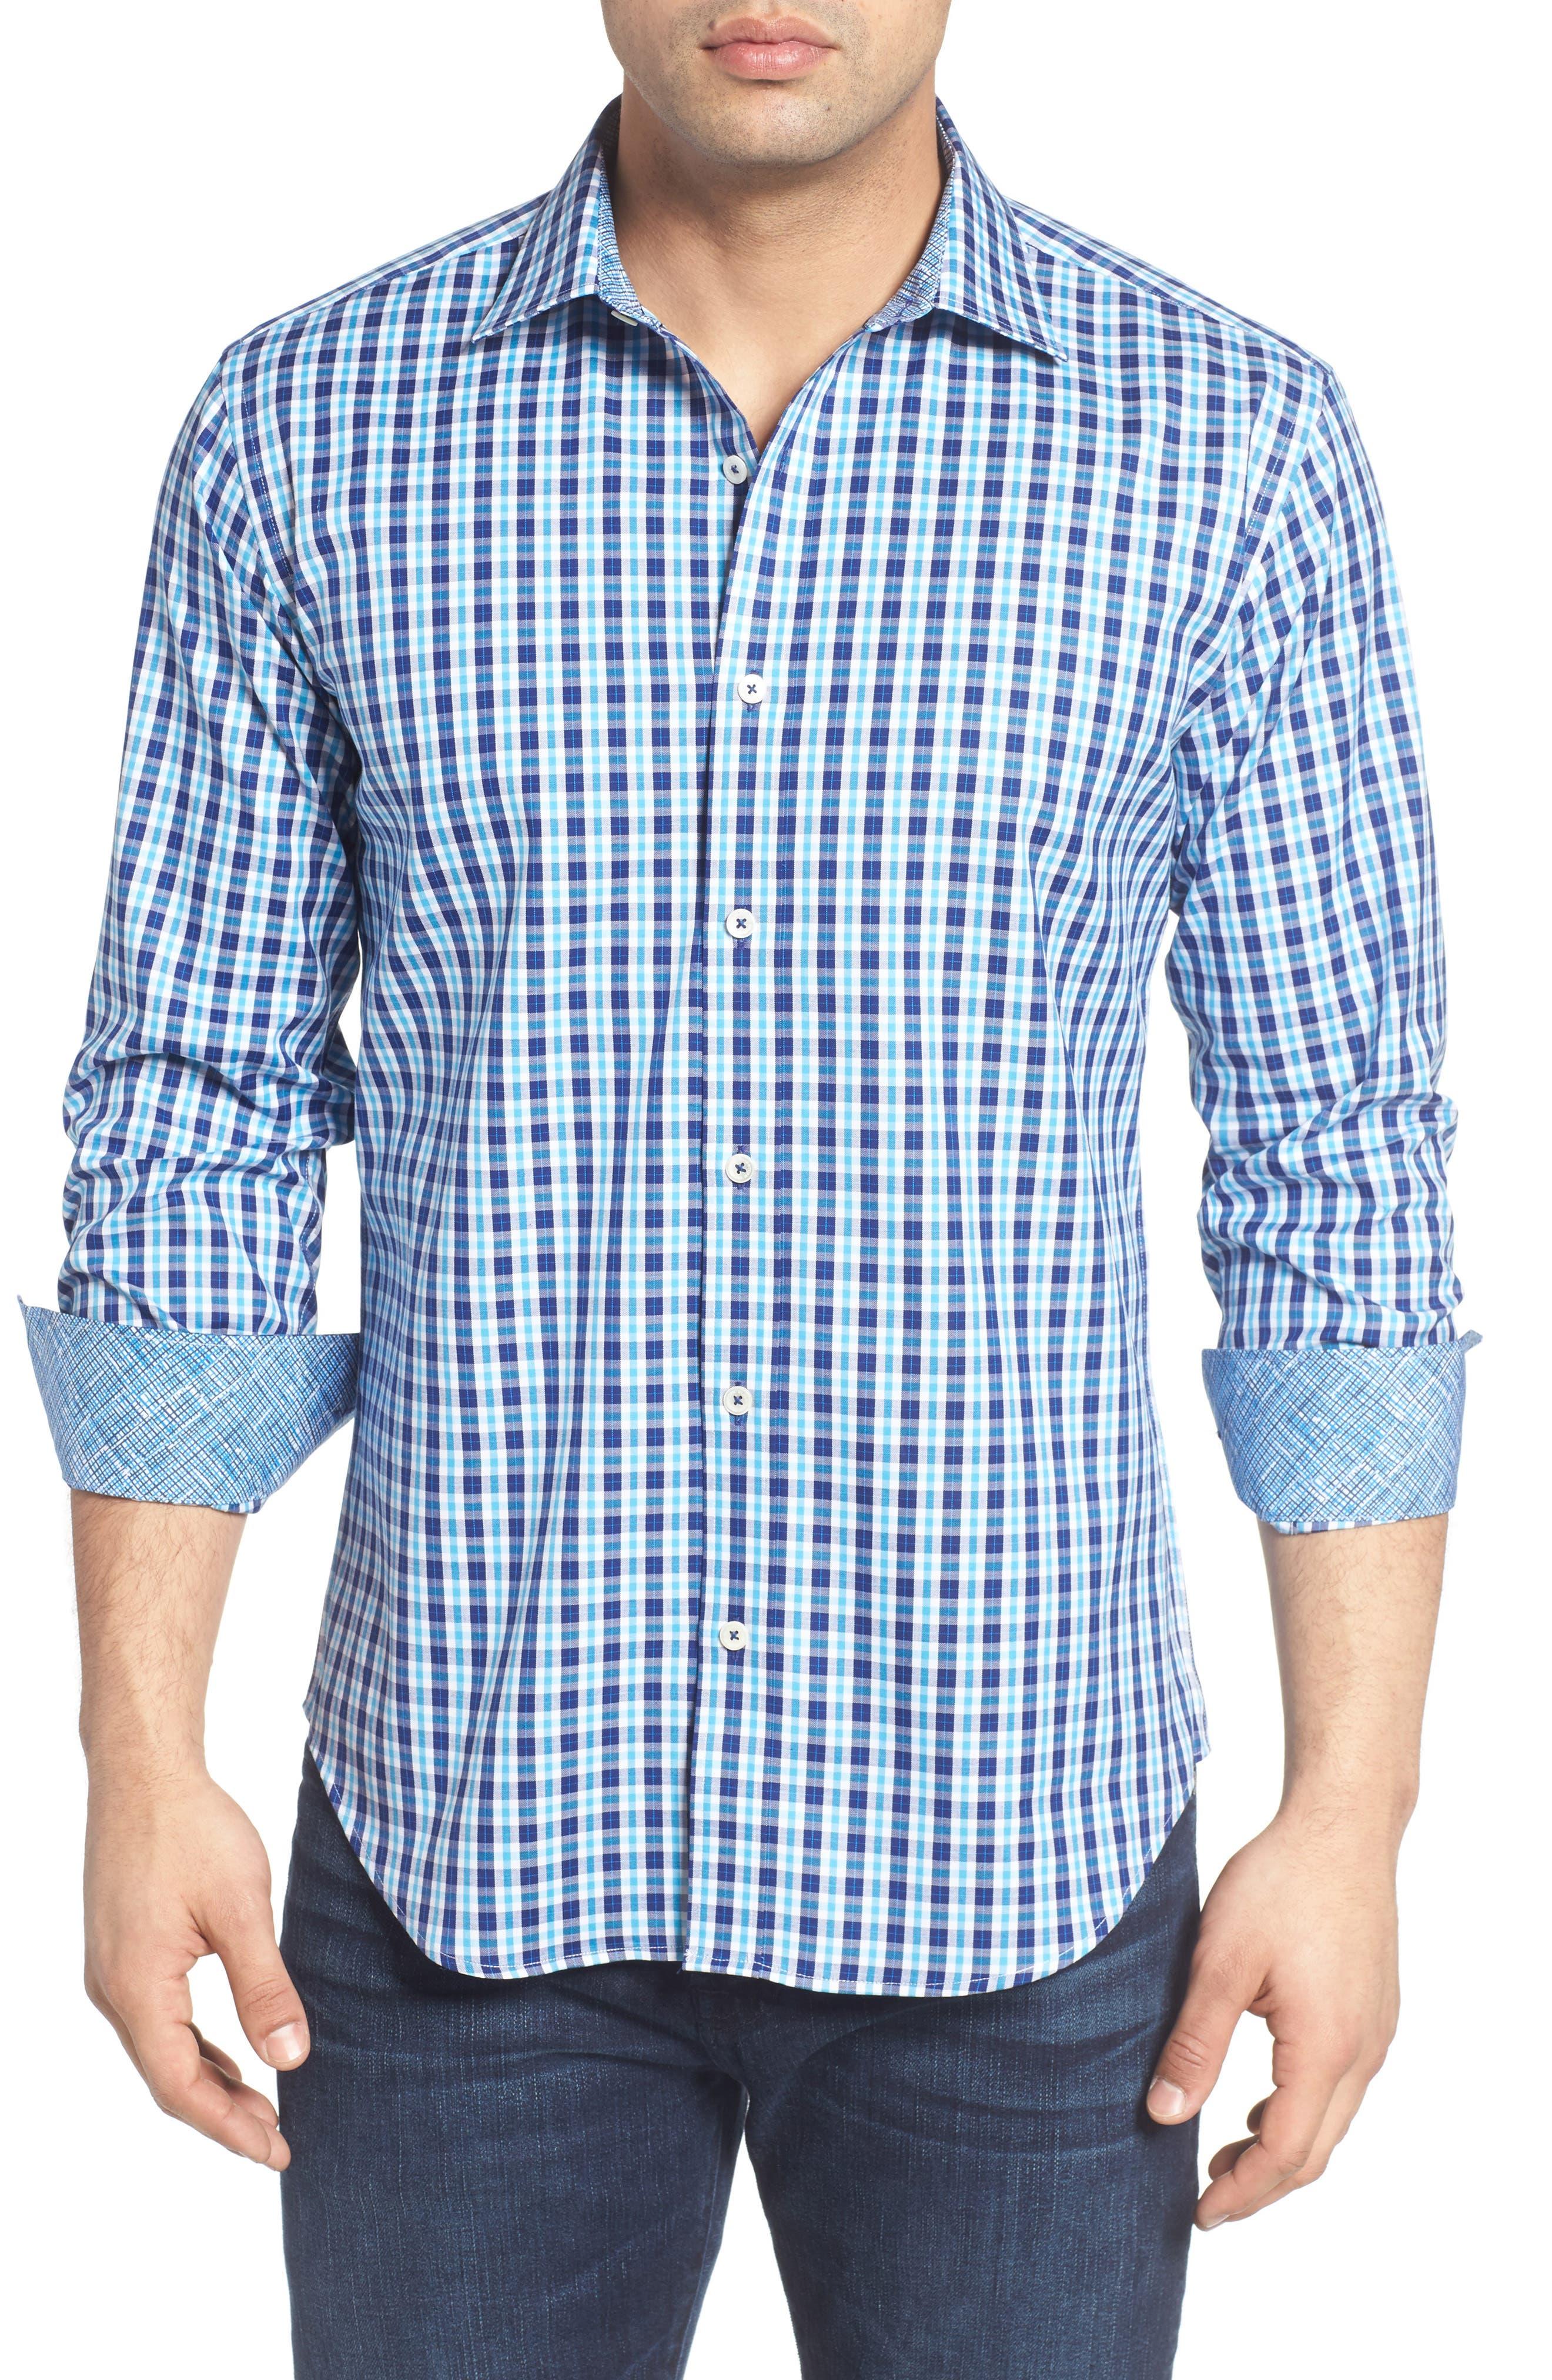 Main Image - Bugatchi Shaped Fit Plaid Sport Shirt